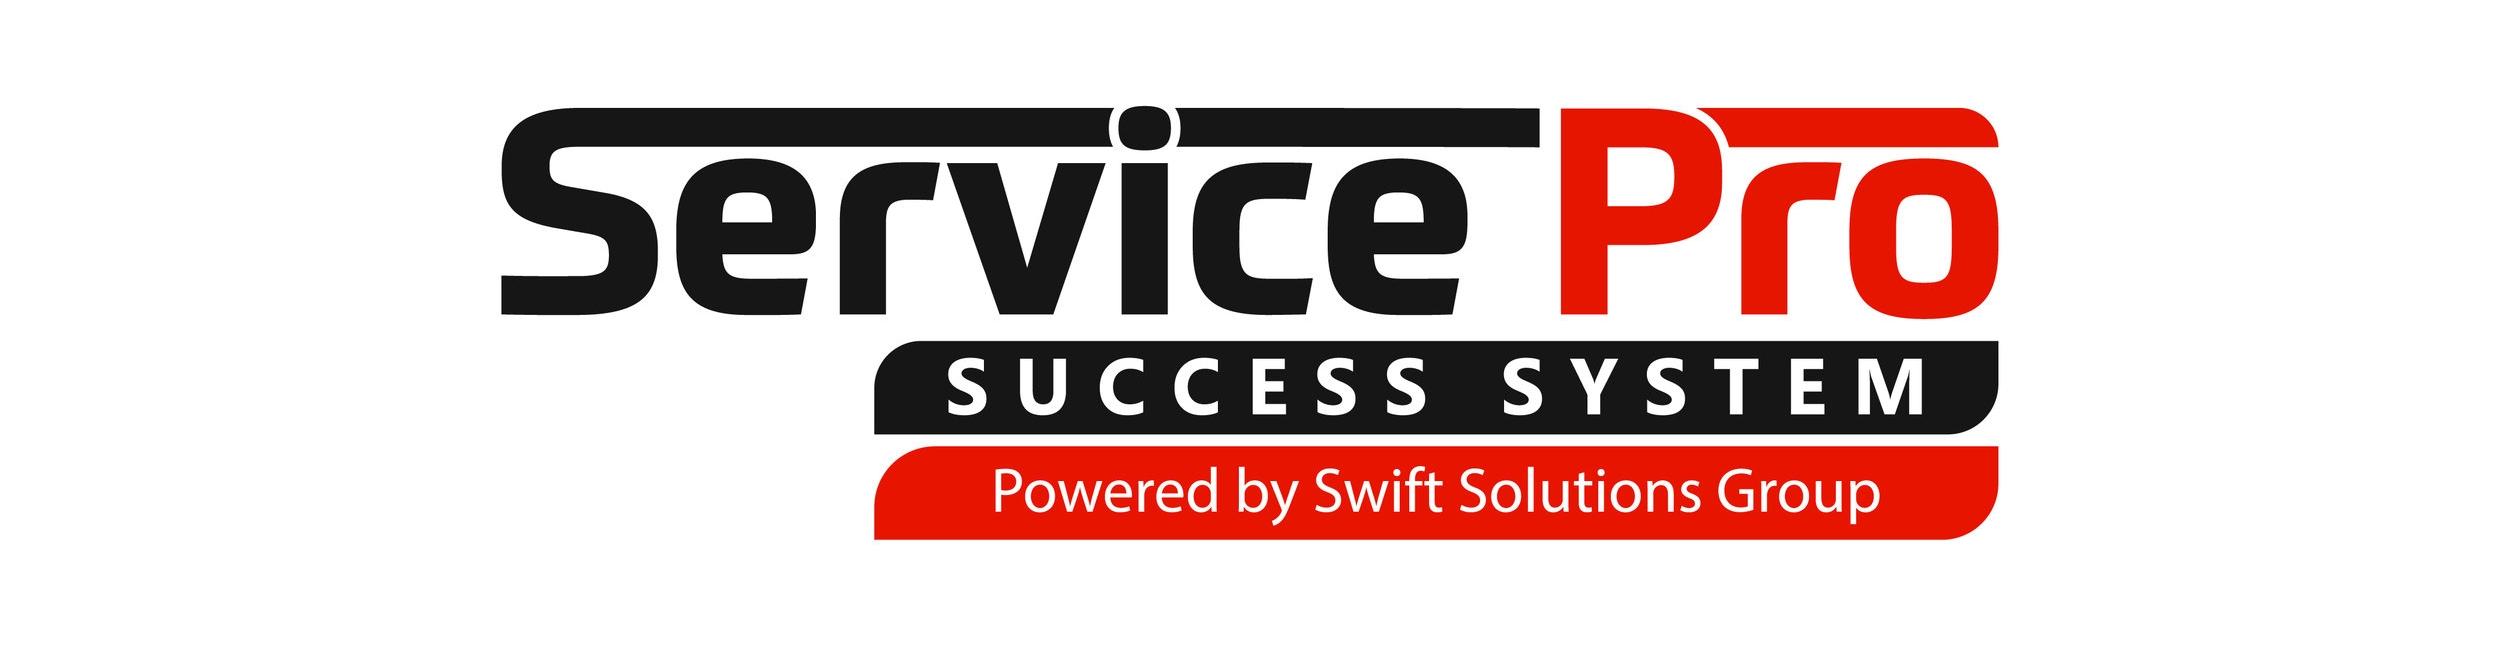 Service Pro Success System Logo JPG High Resolution.jpg